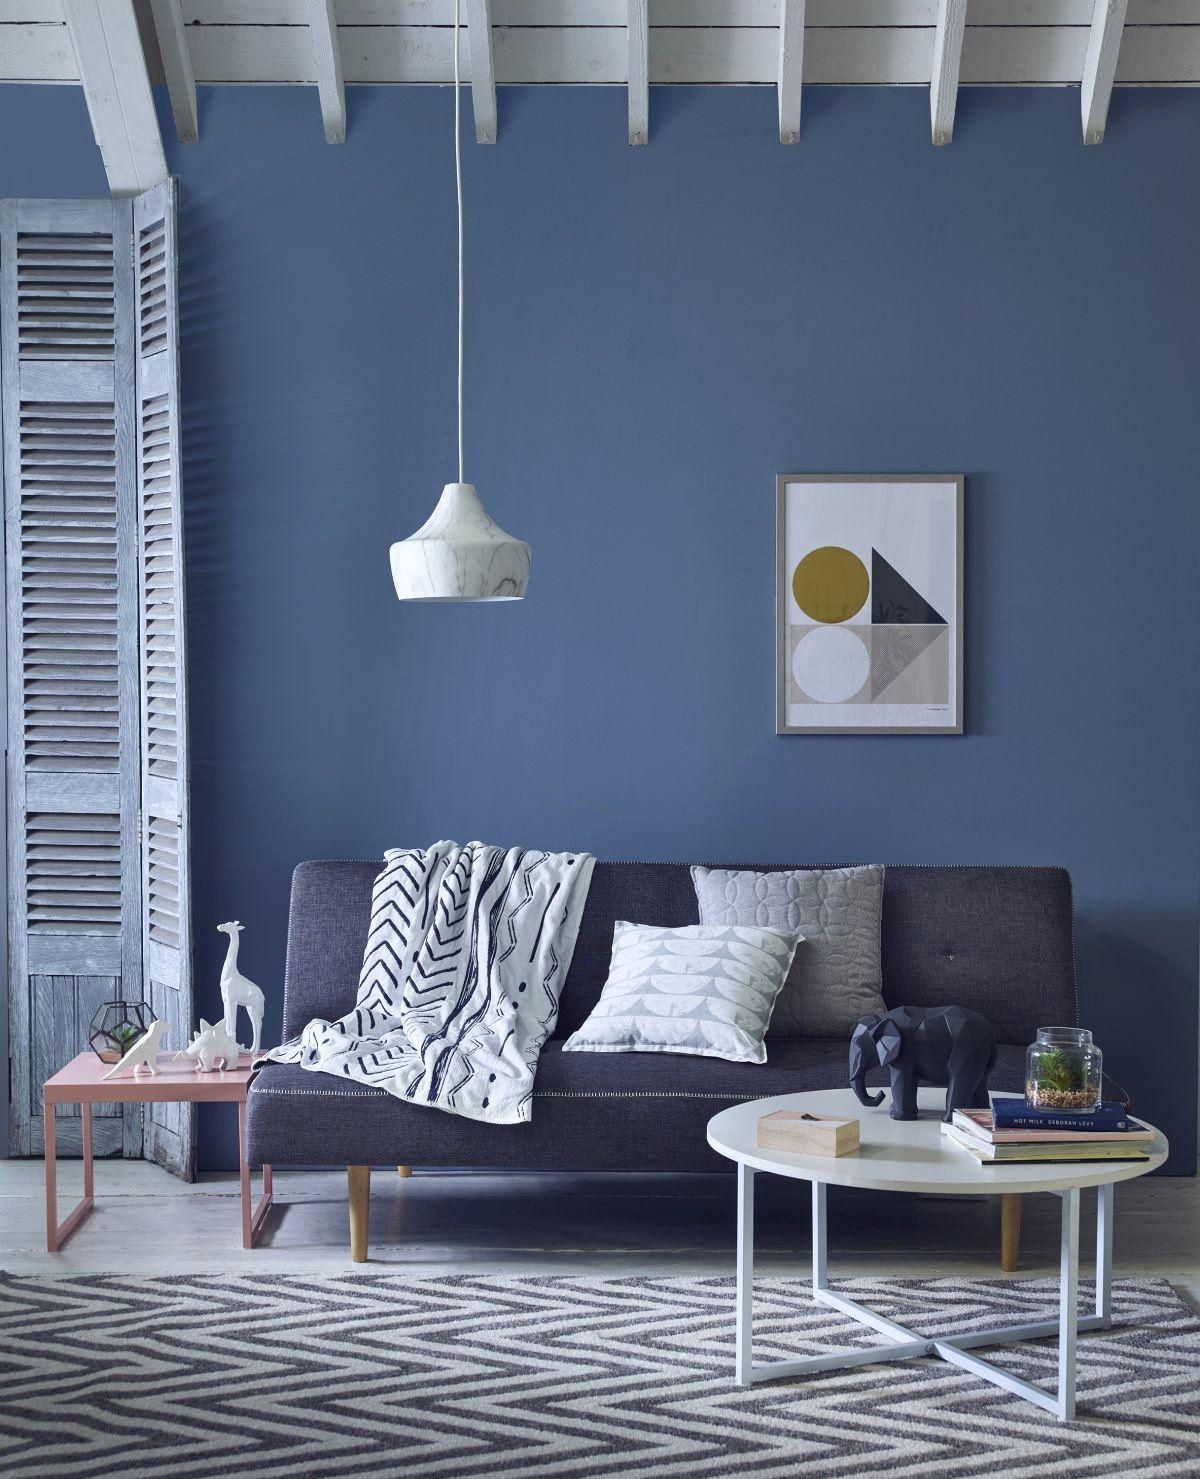 Interior Design Blue Living Room Inspirational Living Room Paint Ideas 18 Beautiful Colo Paint Colors For Living Room Living Room Colors Blue Living Room Color Inspirational living room colors